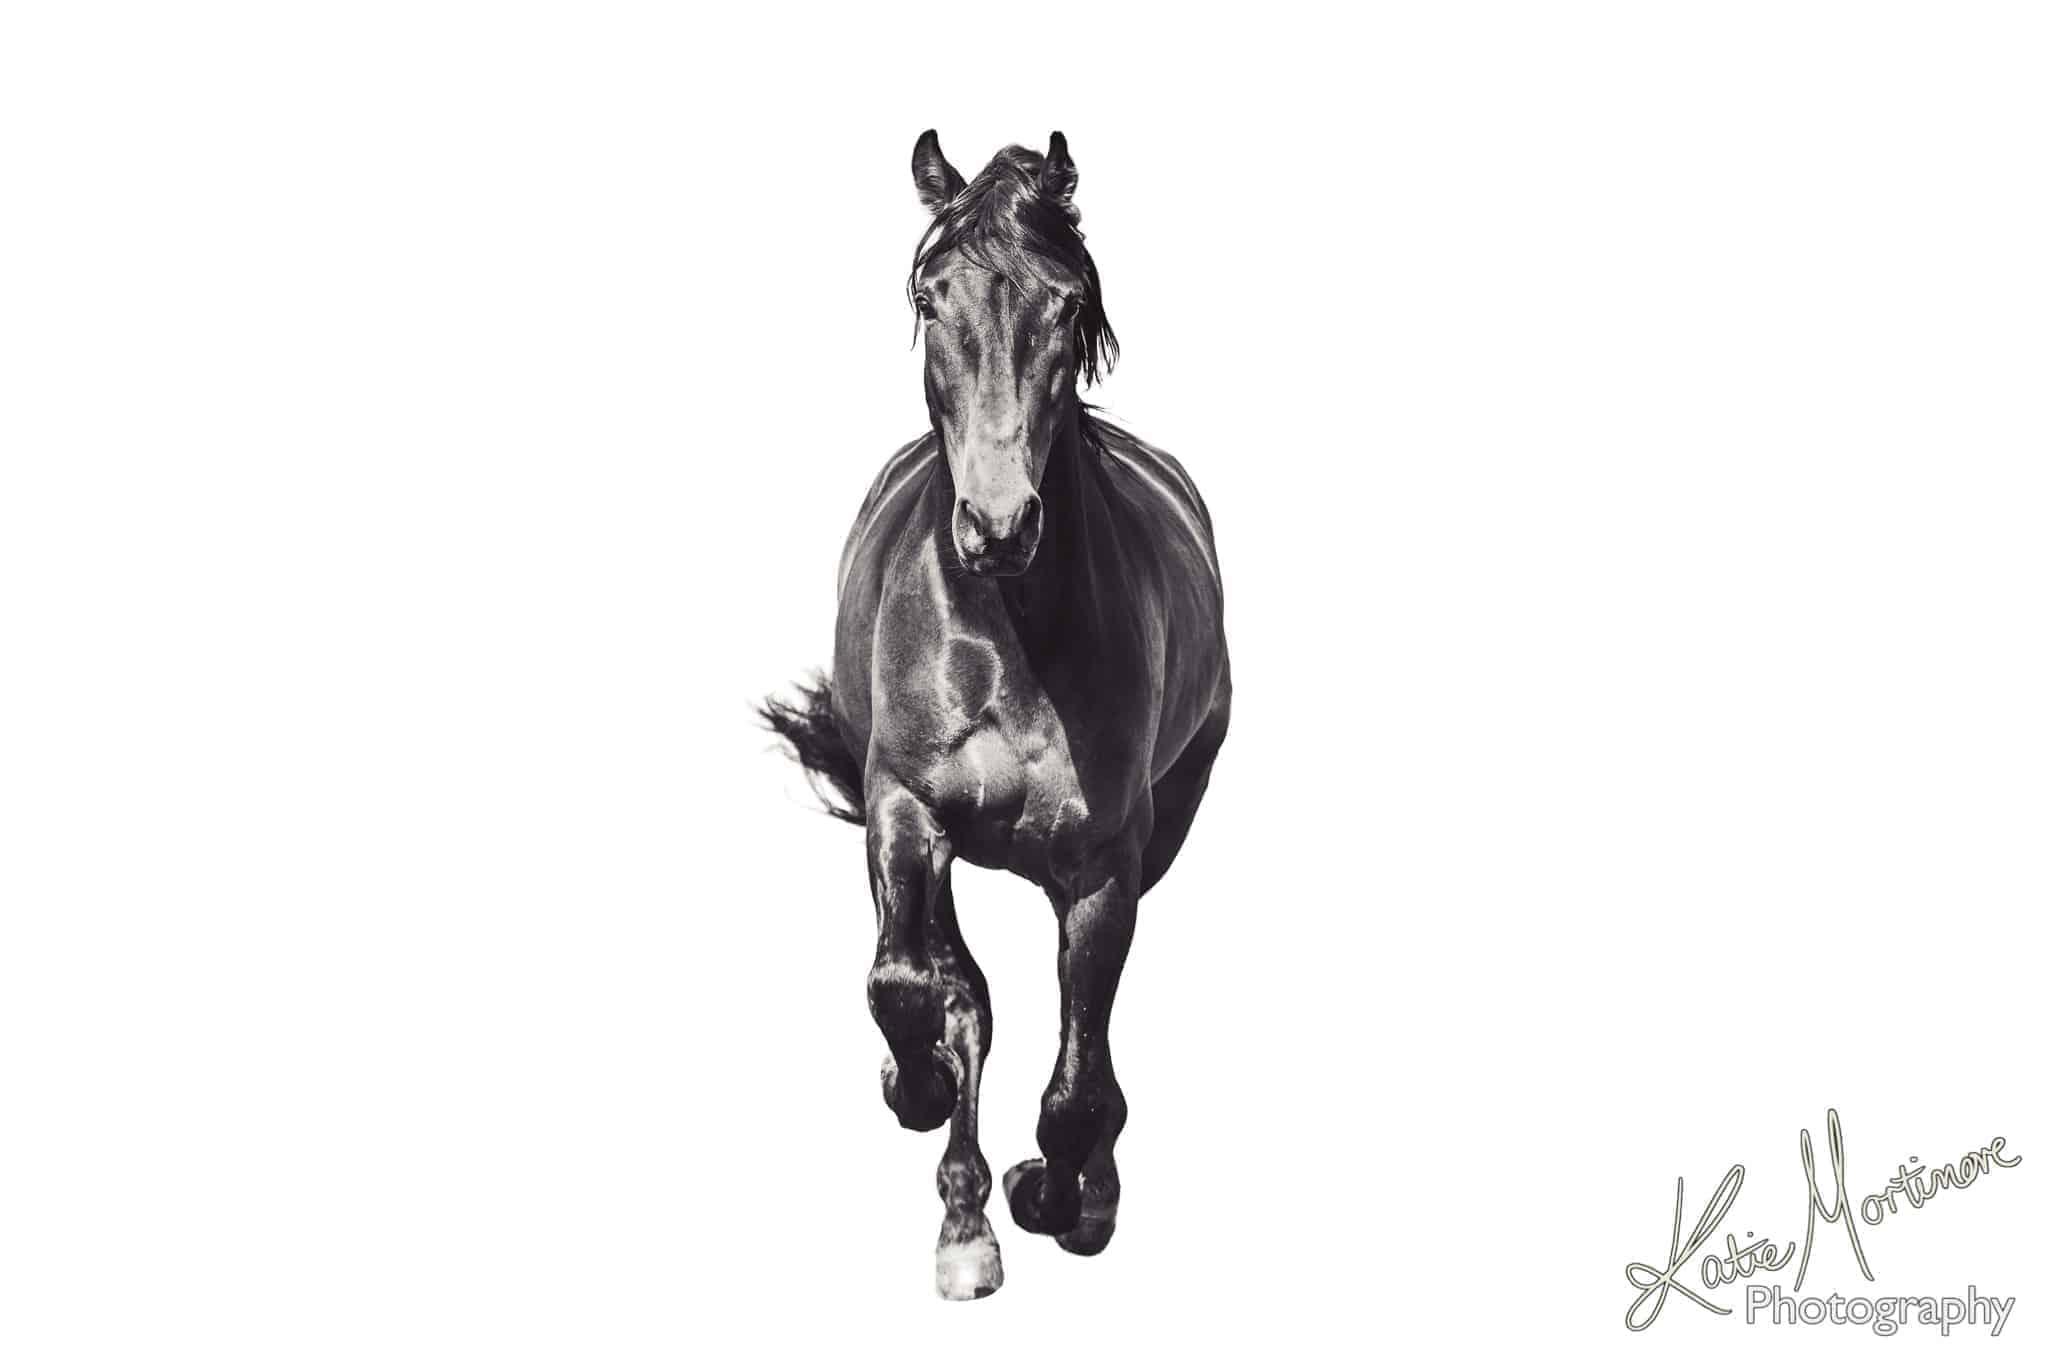 equine supermodel horse portrait photo shoot